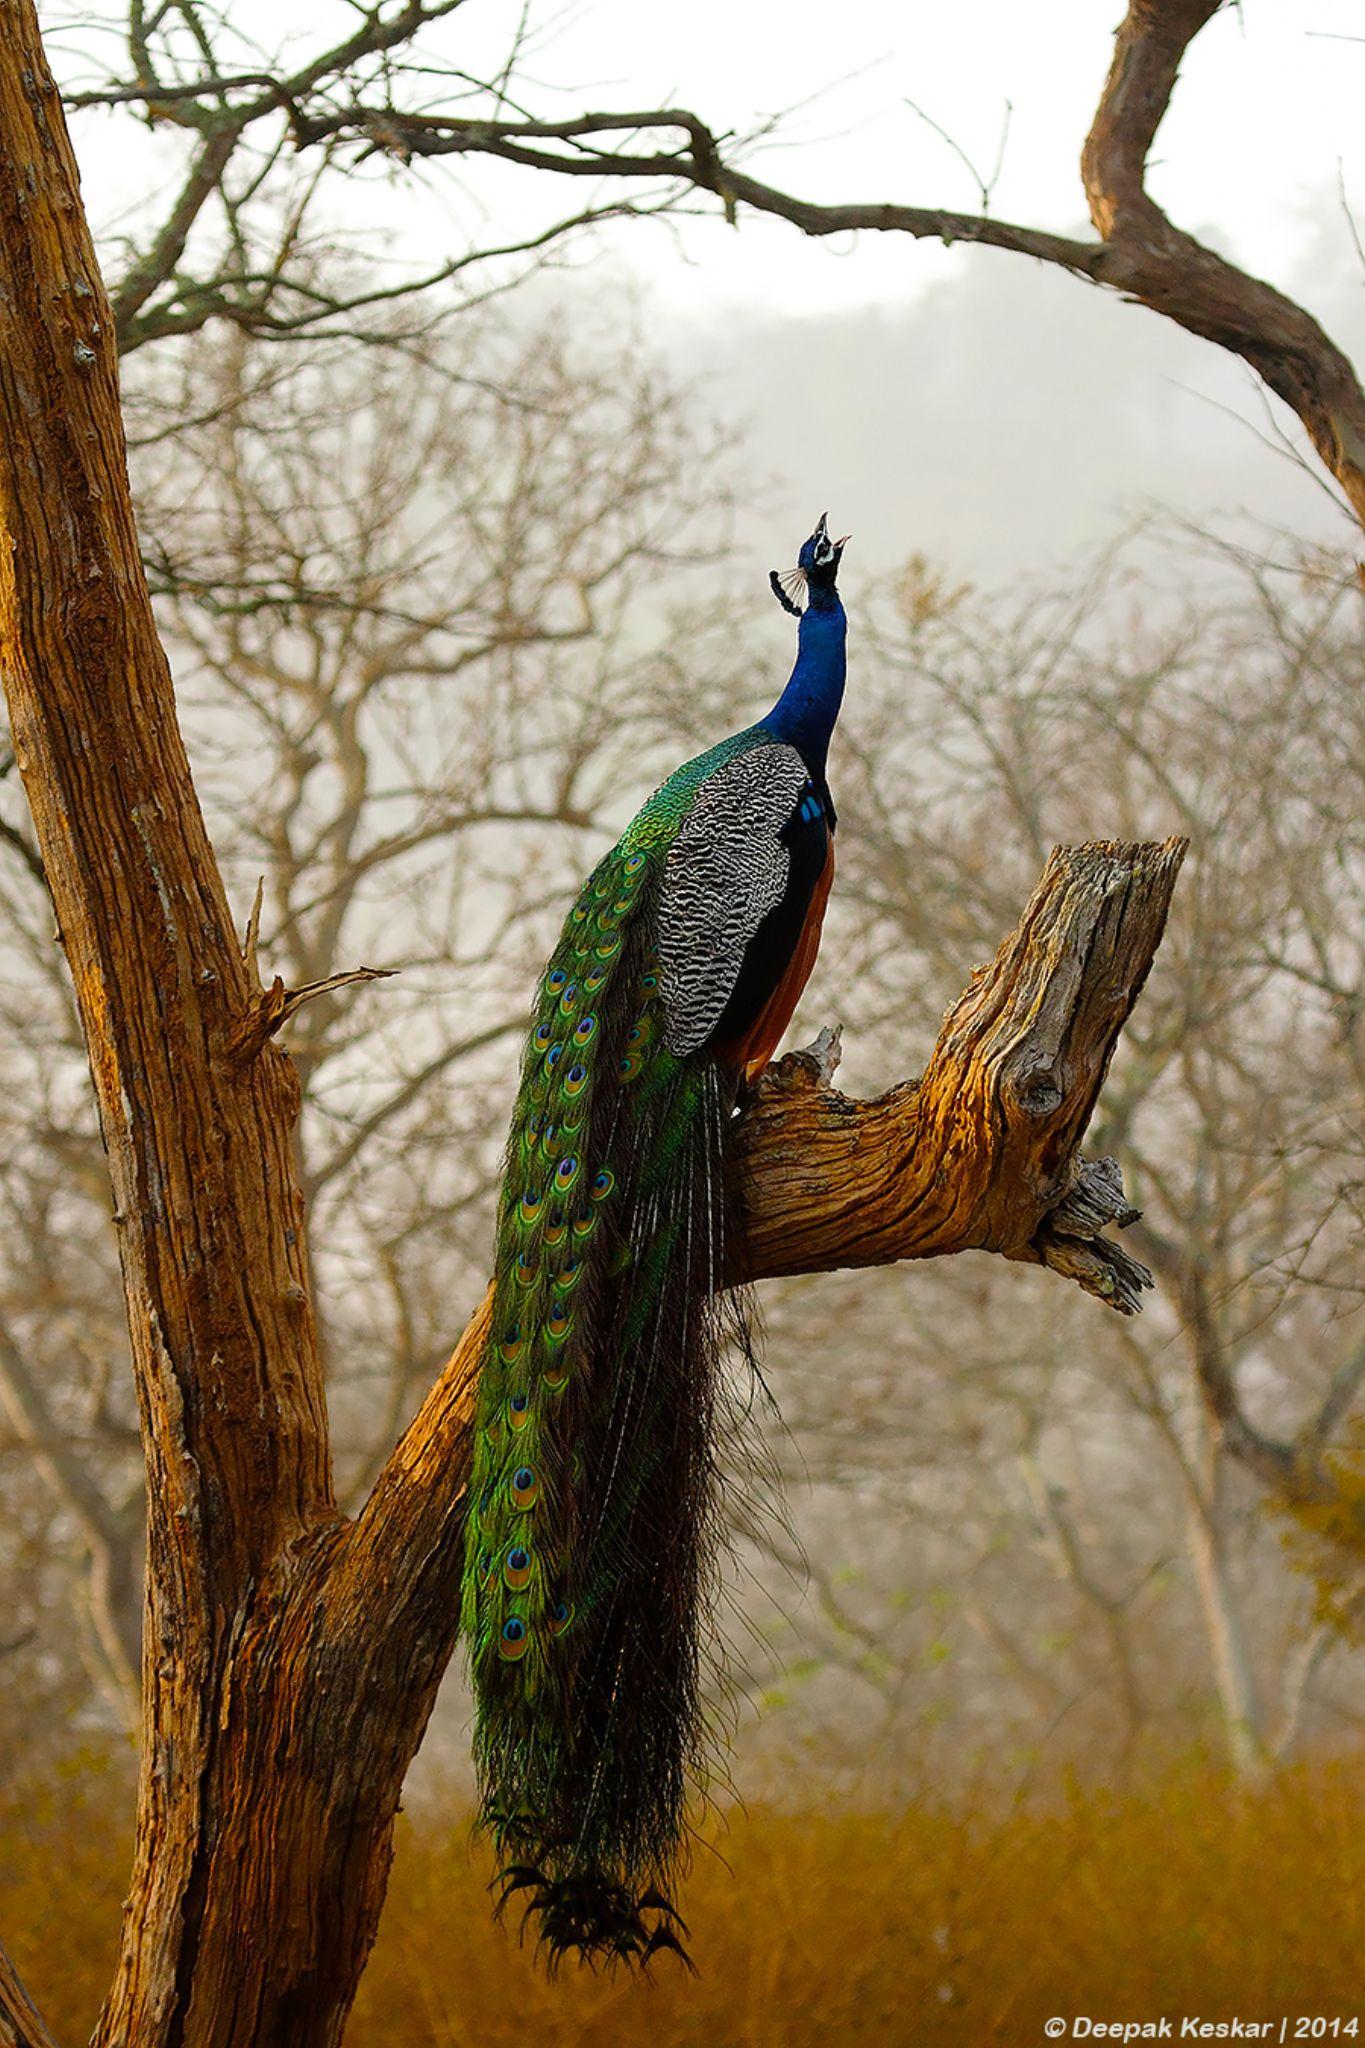 Singing Peacock by Deepak Keskar